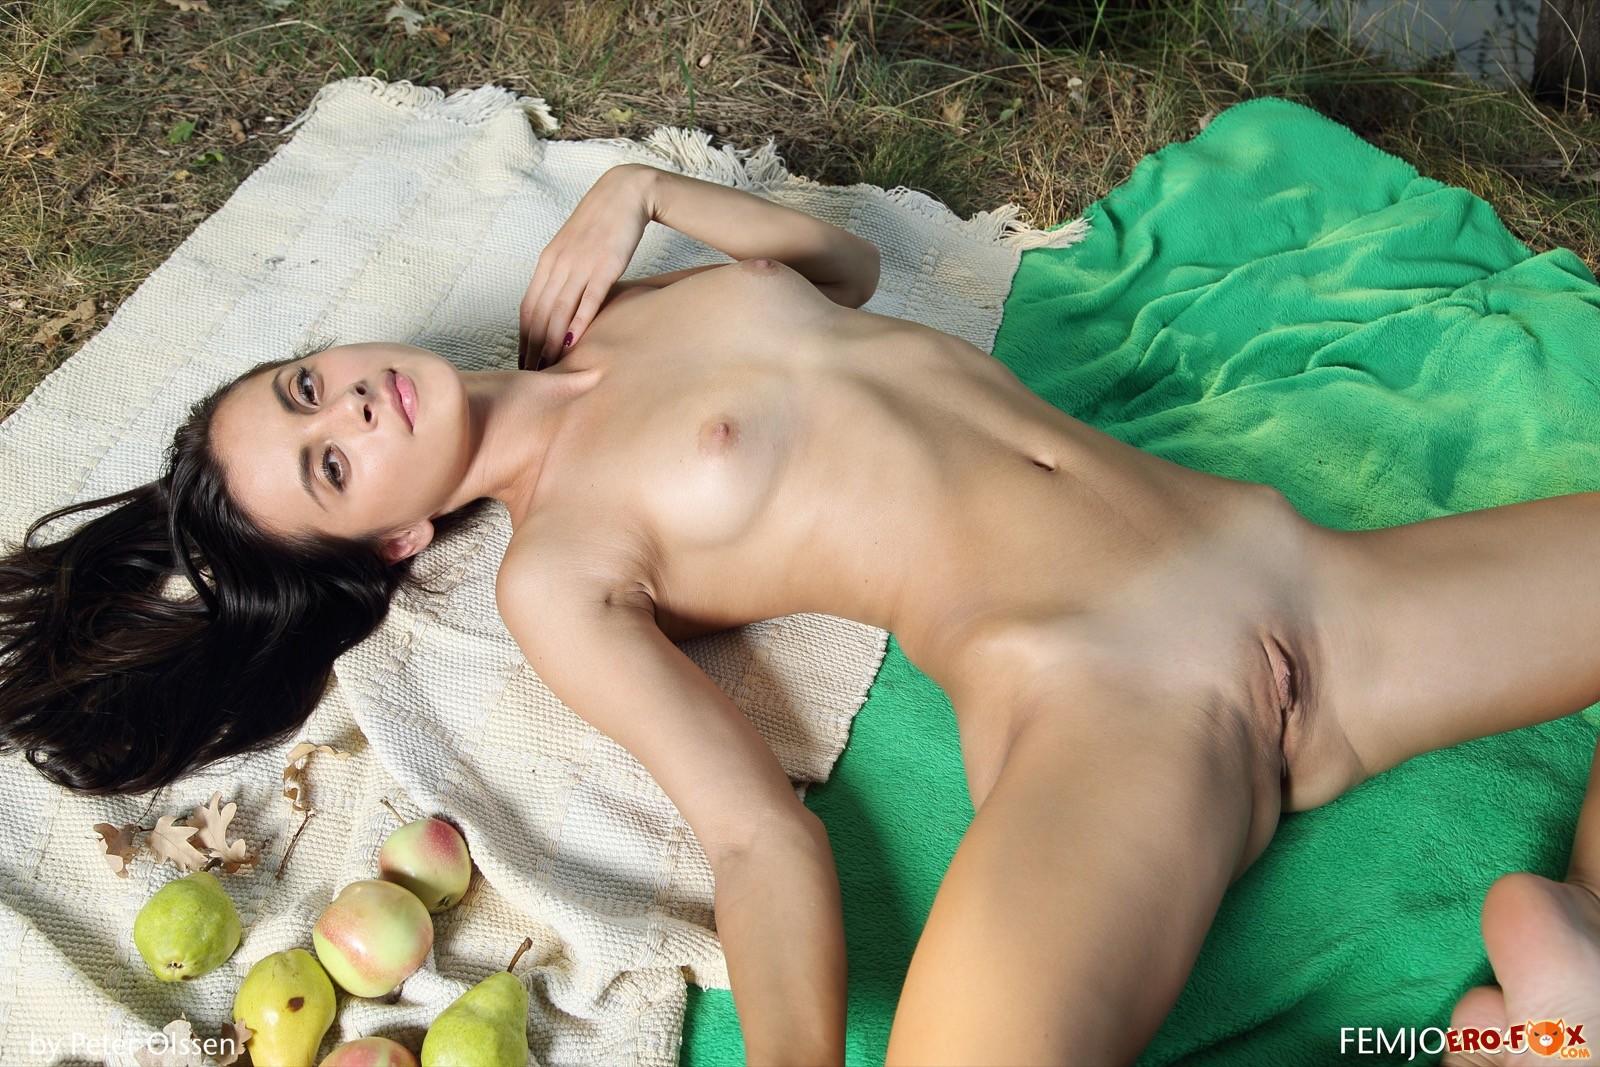 Голая девушка отдыхает на берегу речки